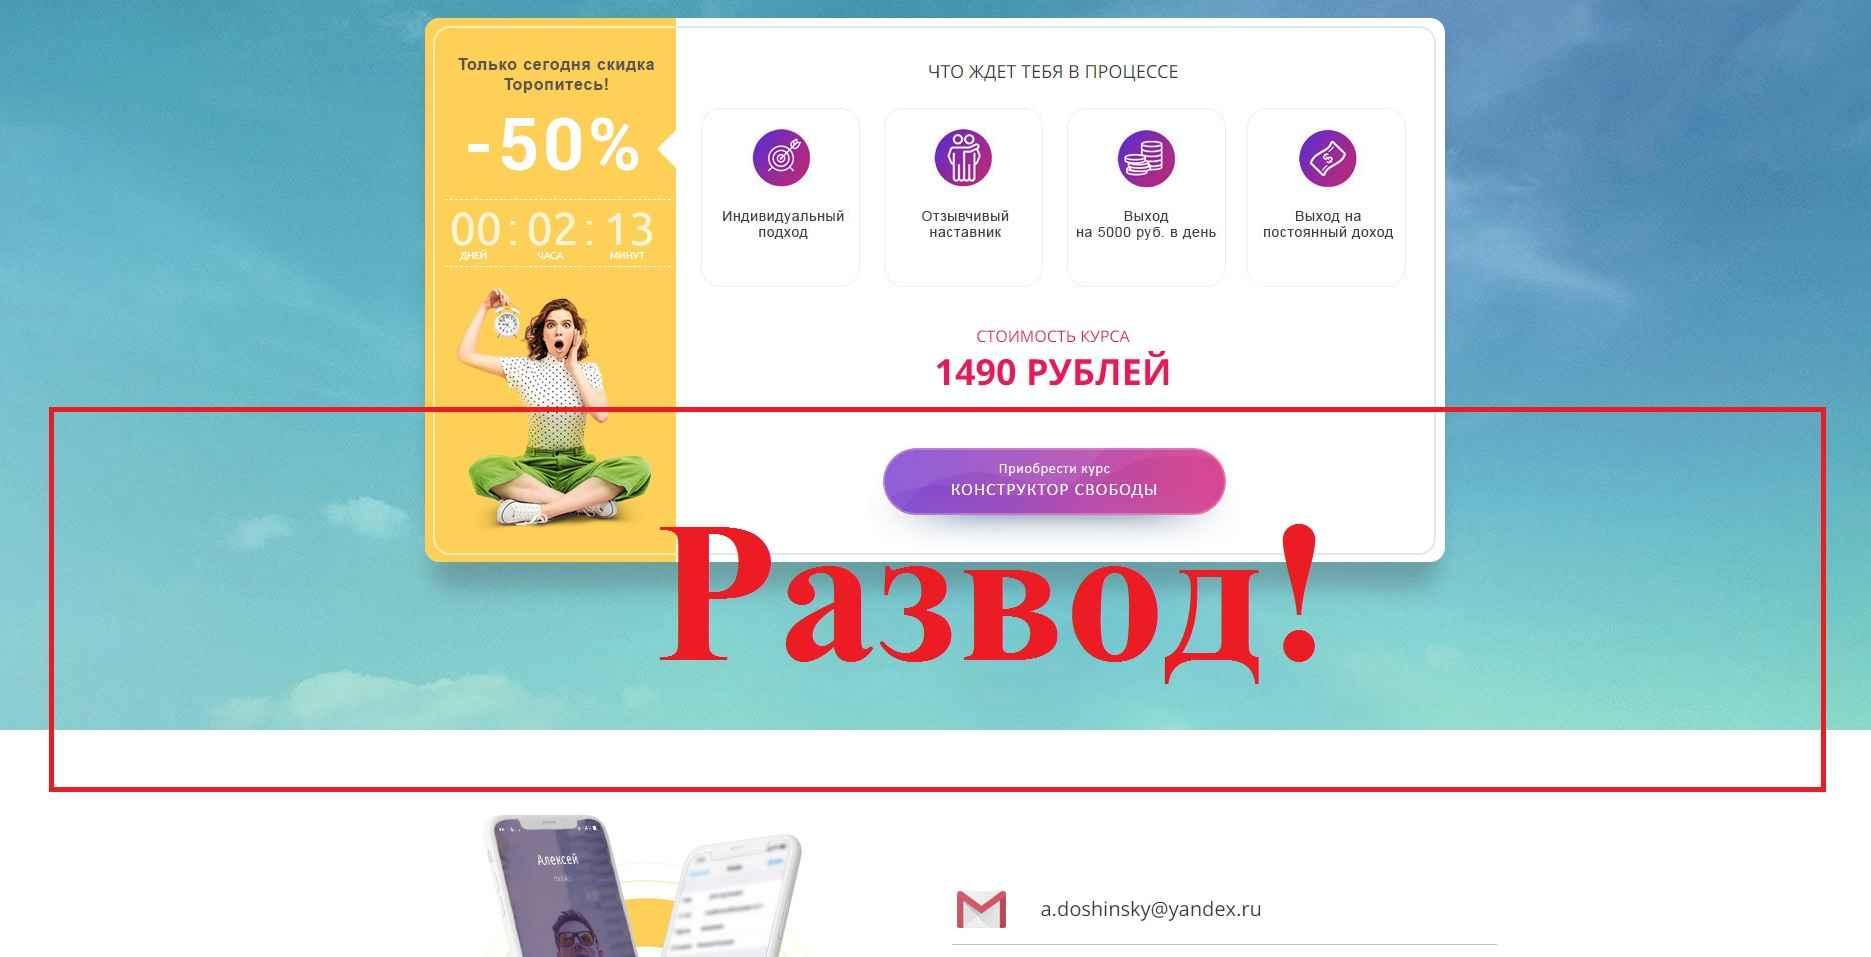 «Конструктор свободы» – отзывы о freedom.topglopart.ru